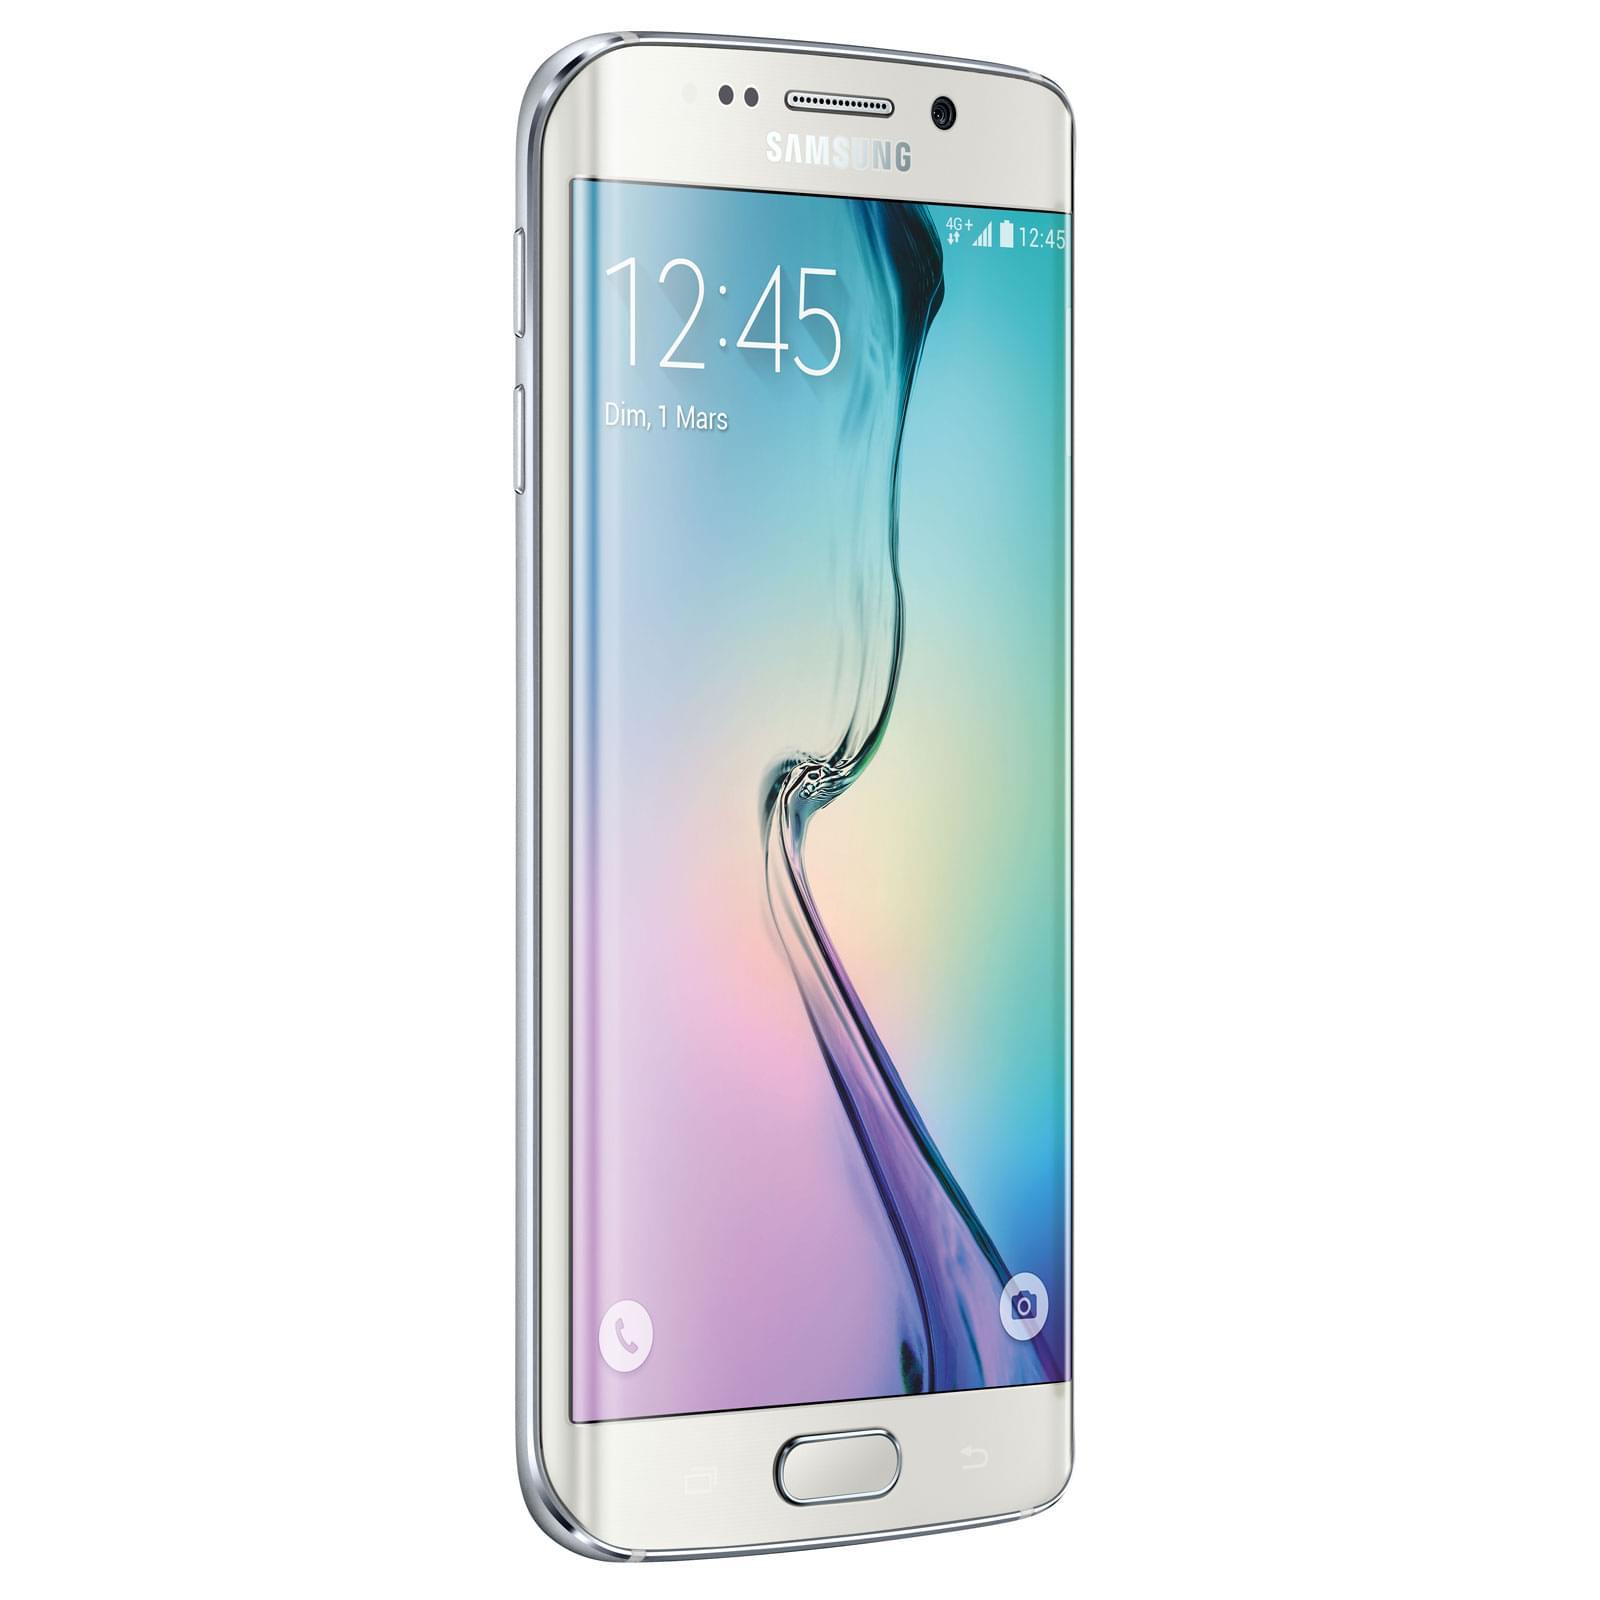 Samsung Galaxy S6 Edge 32Gb White G925F (SM-G925FZWANEE) - Achat / Vente Téléphonie sur Cybertek.fr - 0